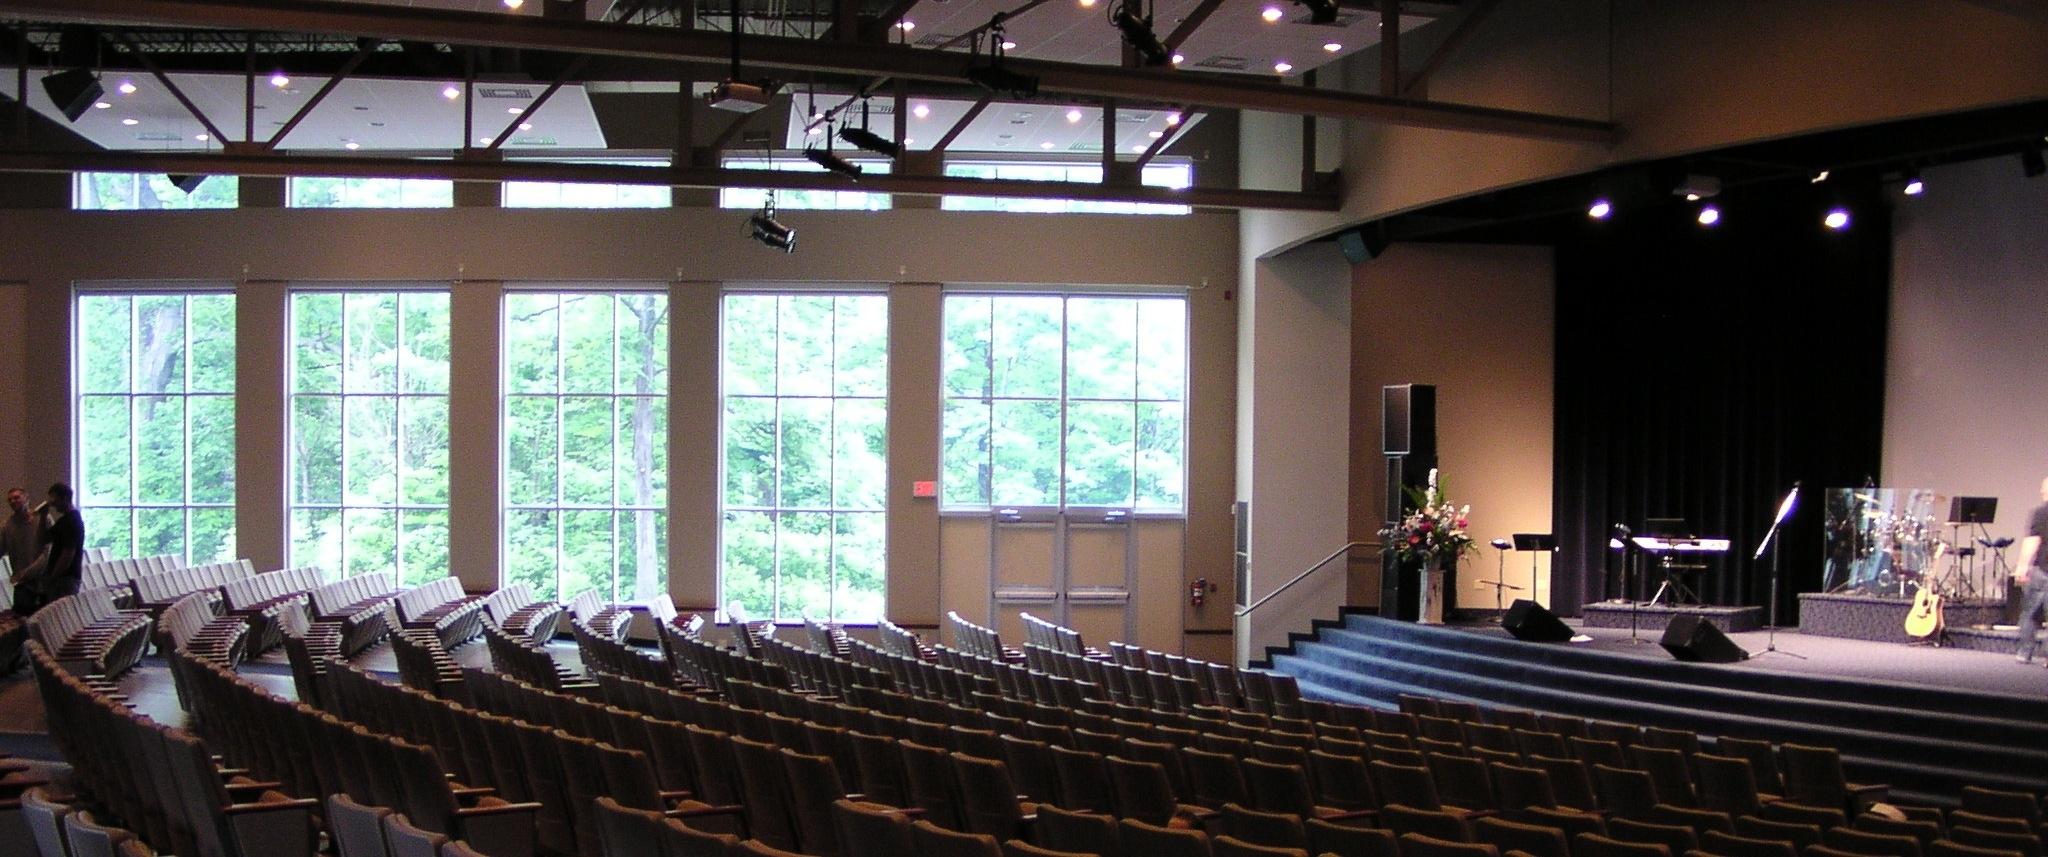 21St Century Churches: 5 Ways To Arrange Your Church